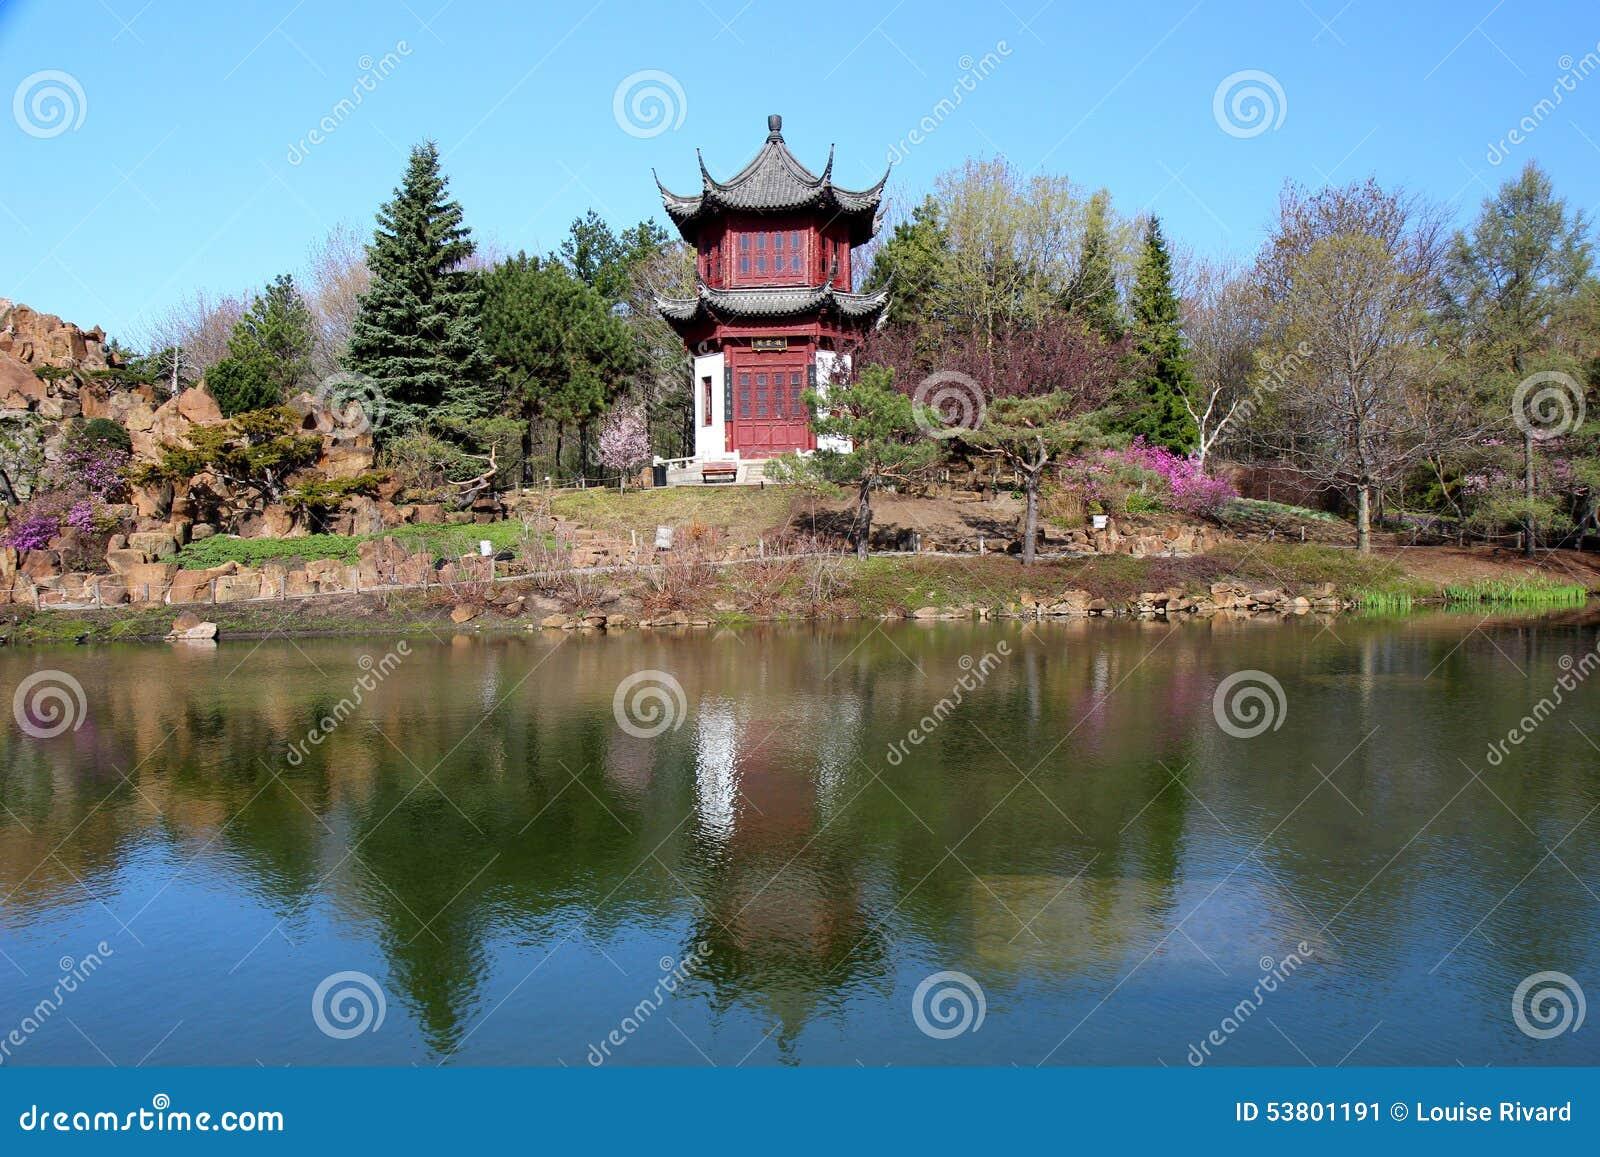 Chinese garden at spring